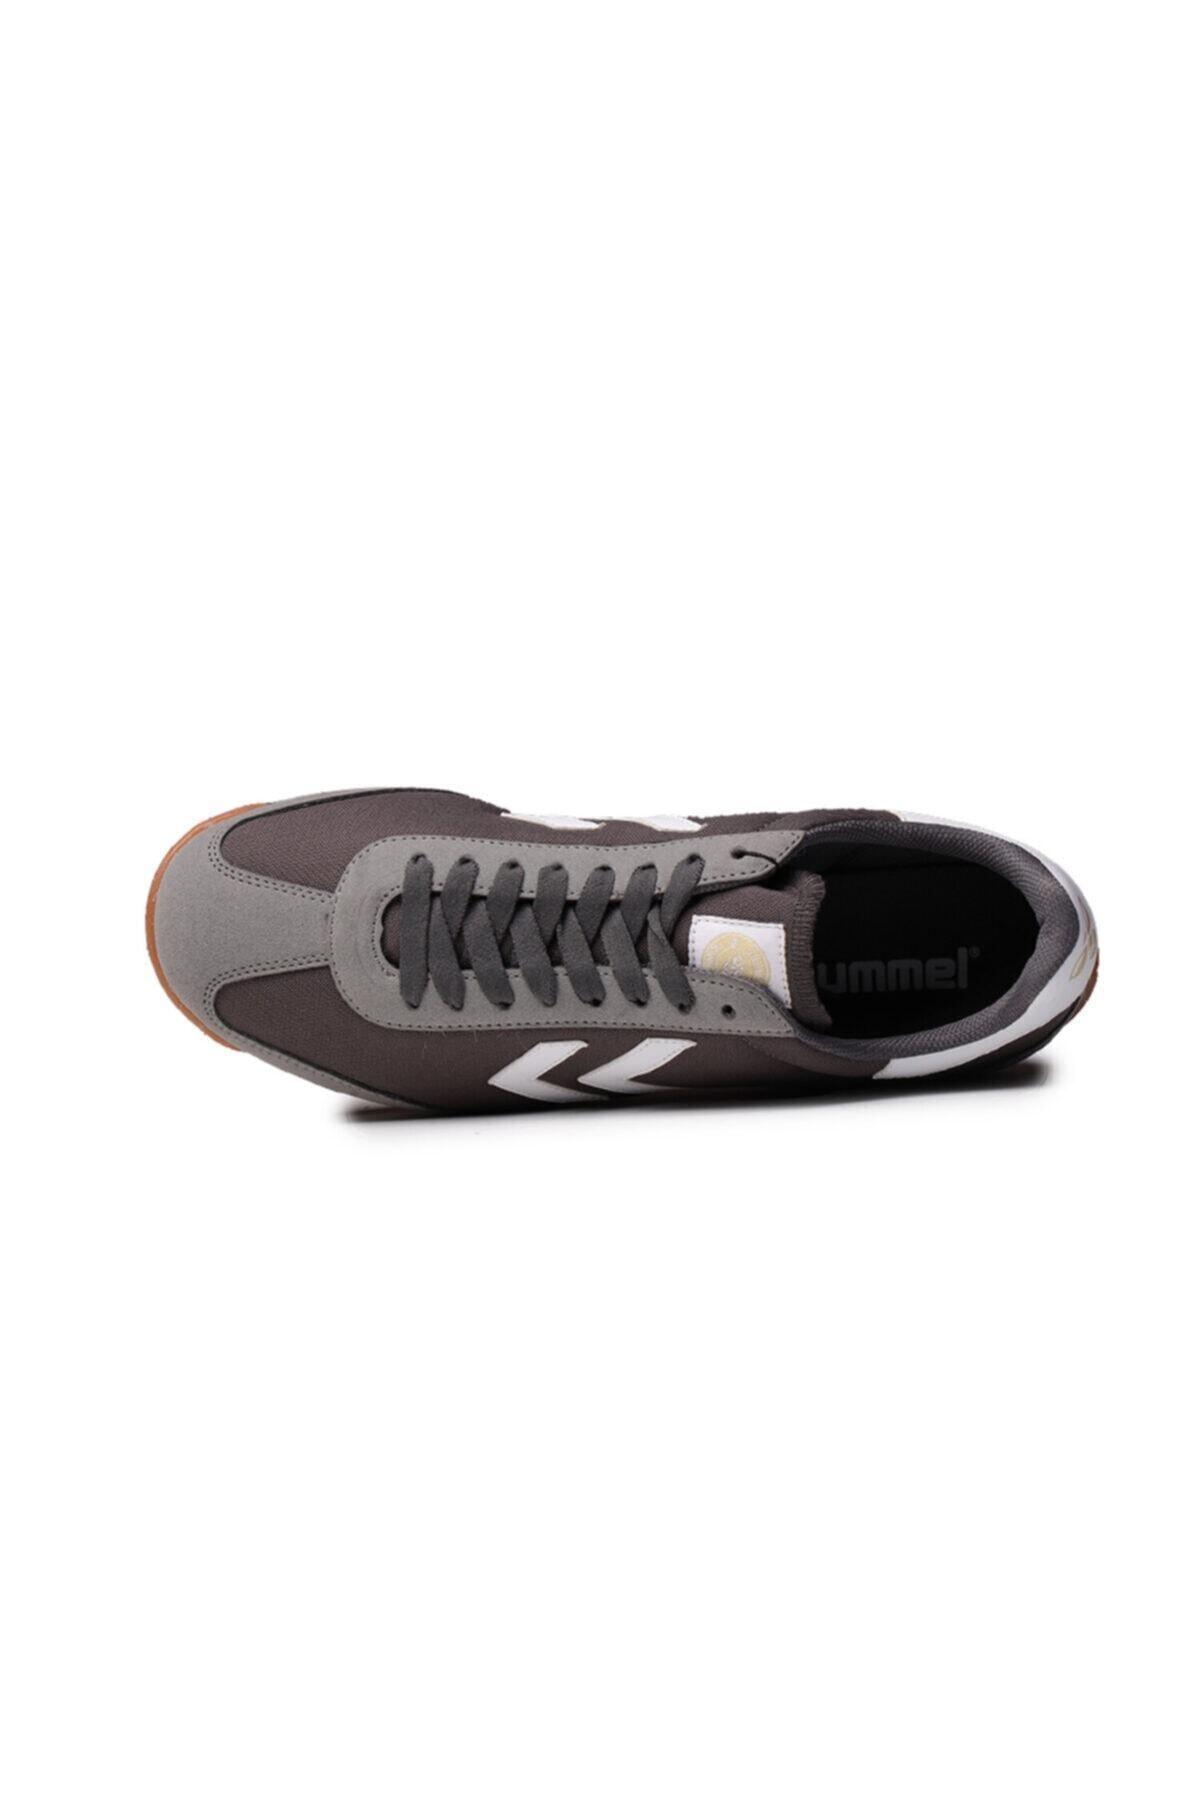 HUMMEL STADION III LIFESTYLE SHO Gri Erkek Sneaker Ayakkabı 100584576 2